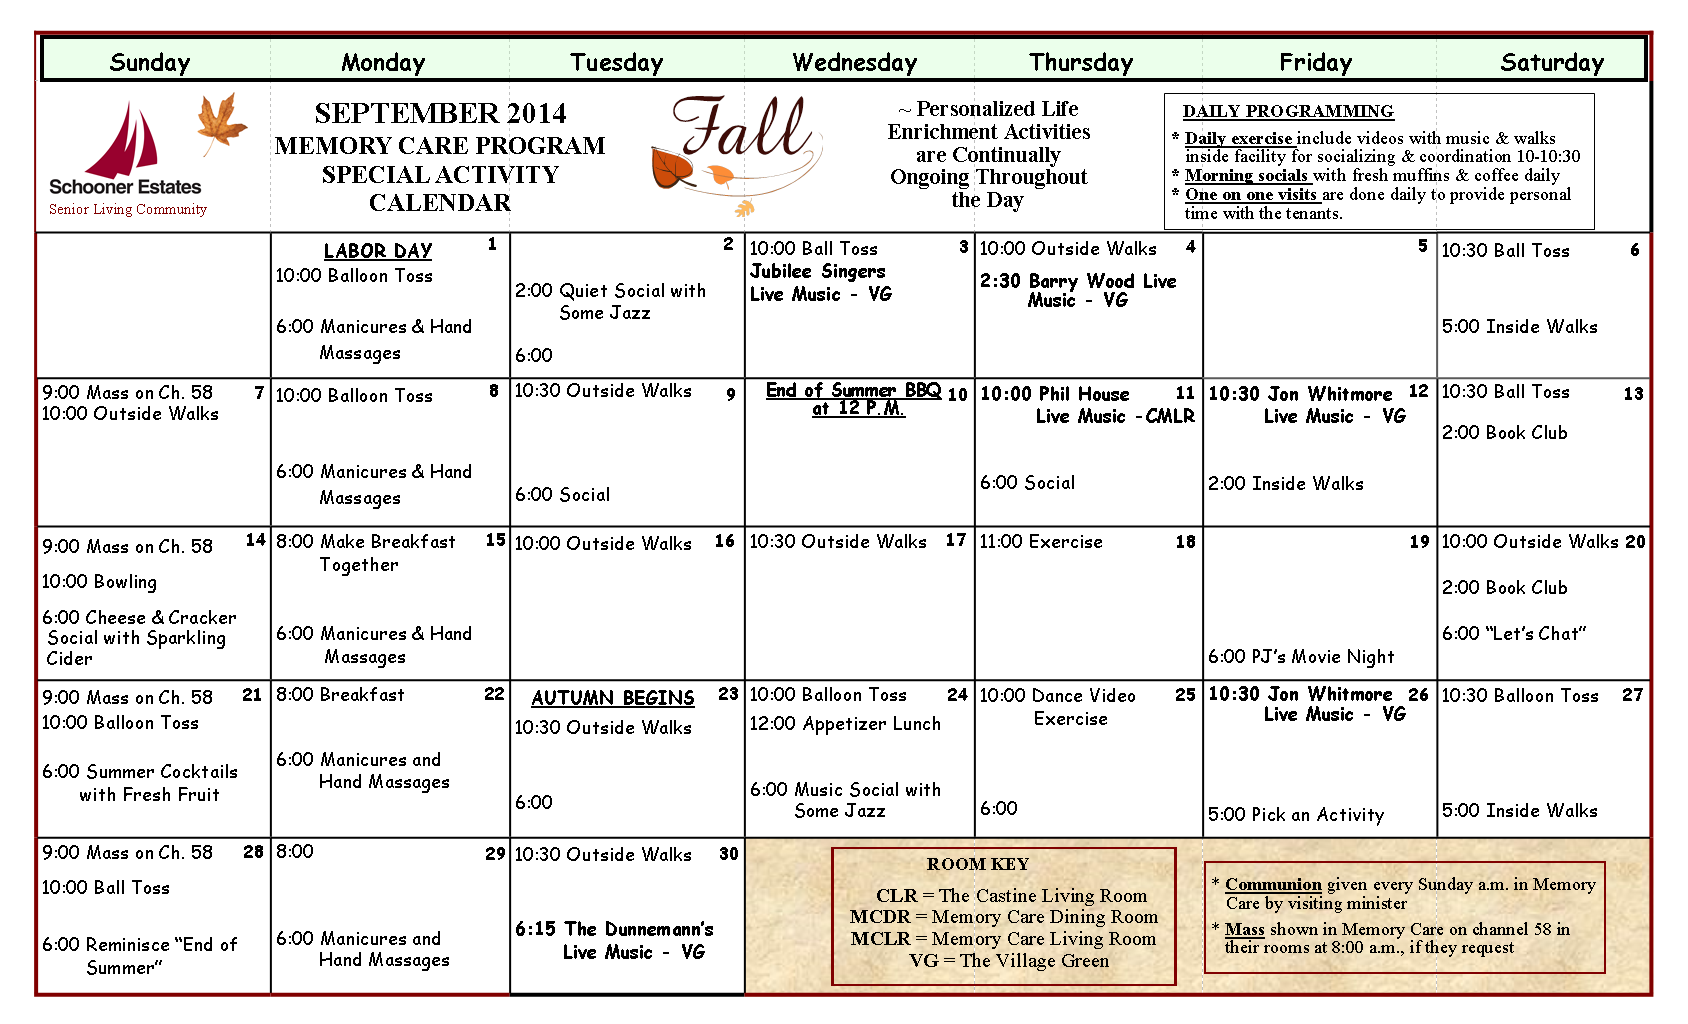 September Schooner Estates Memory Care Calendar